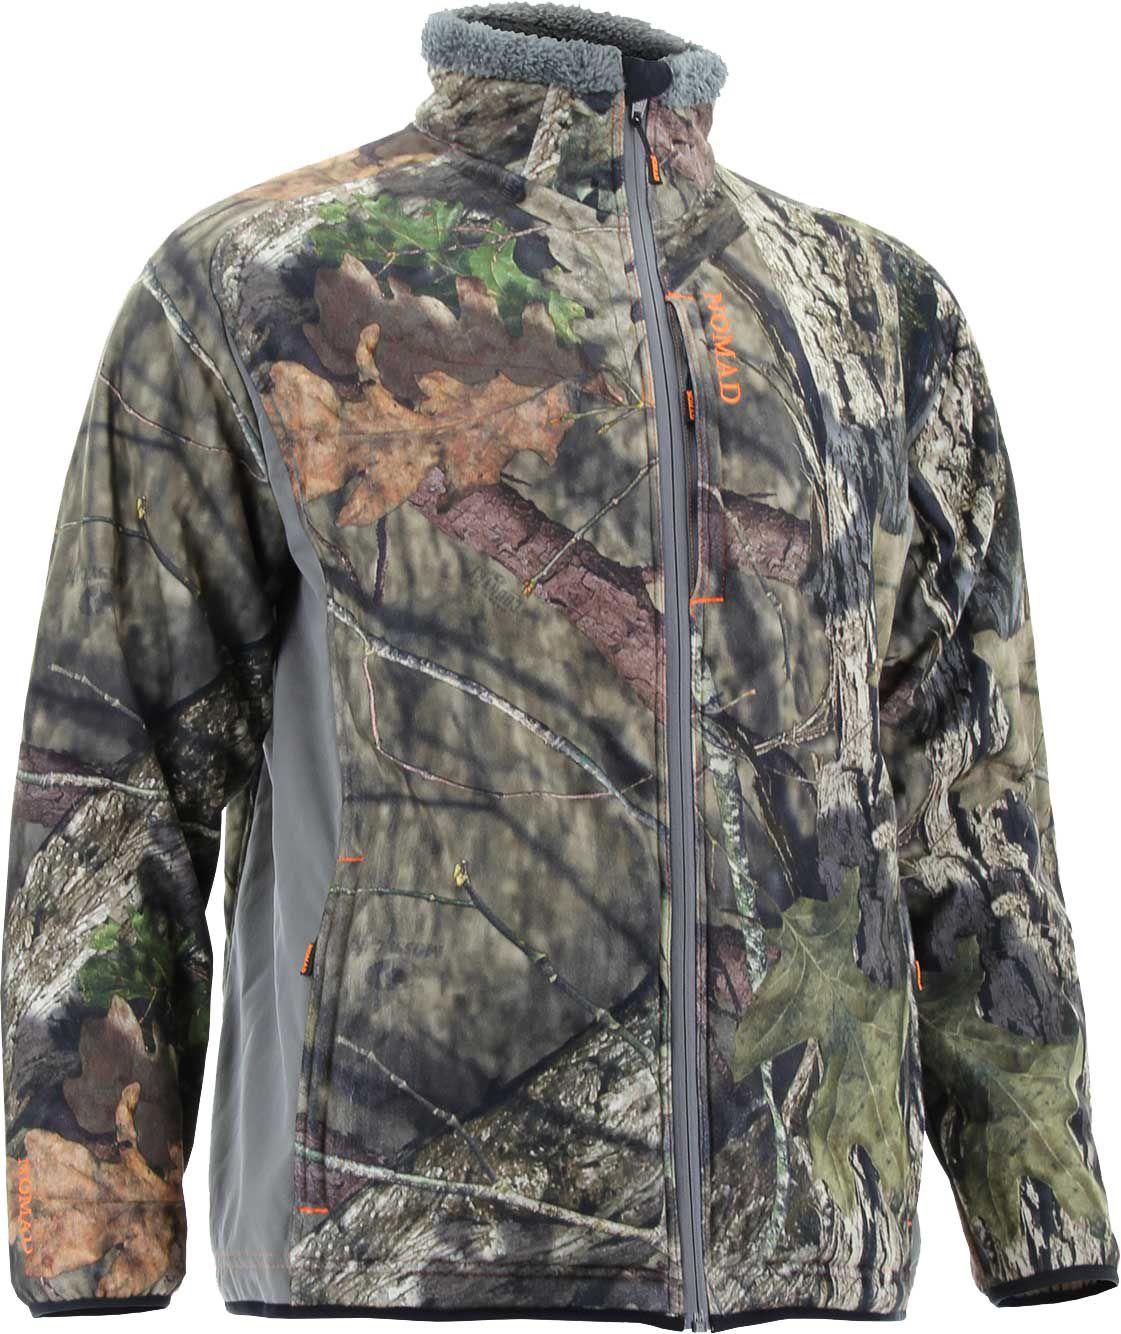 Nomad Men's Harvester FZ Hunting Jacket, Size: Medium, Mossy Oak Brk-Up Country thumbnail